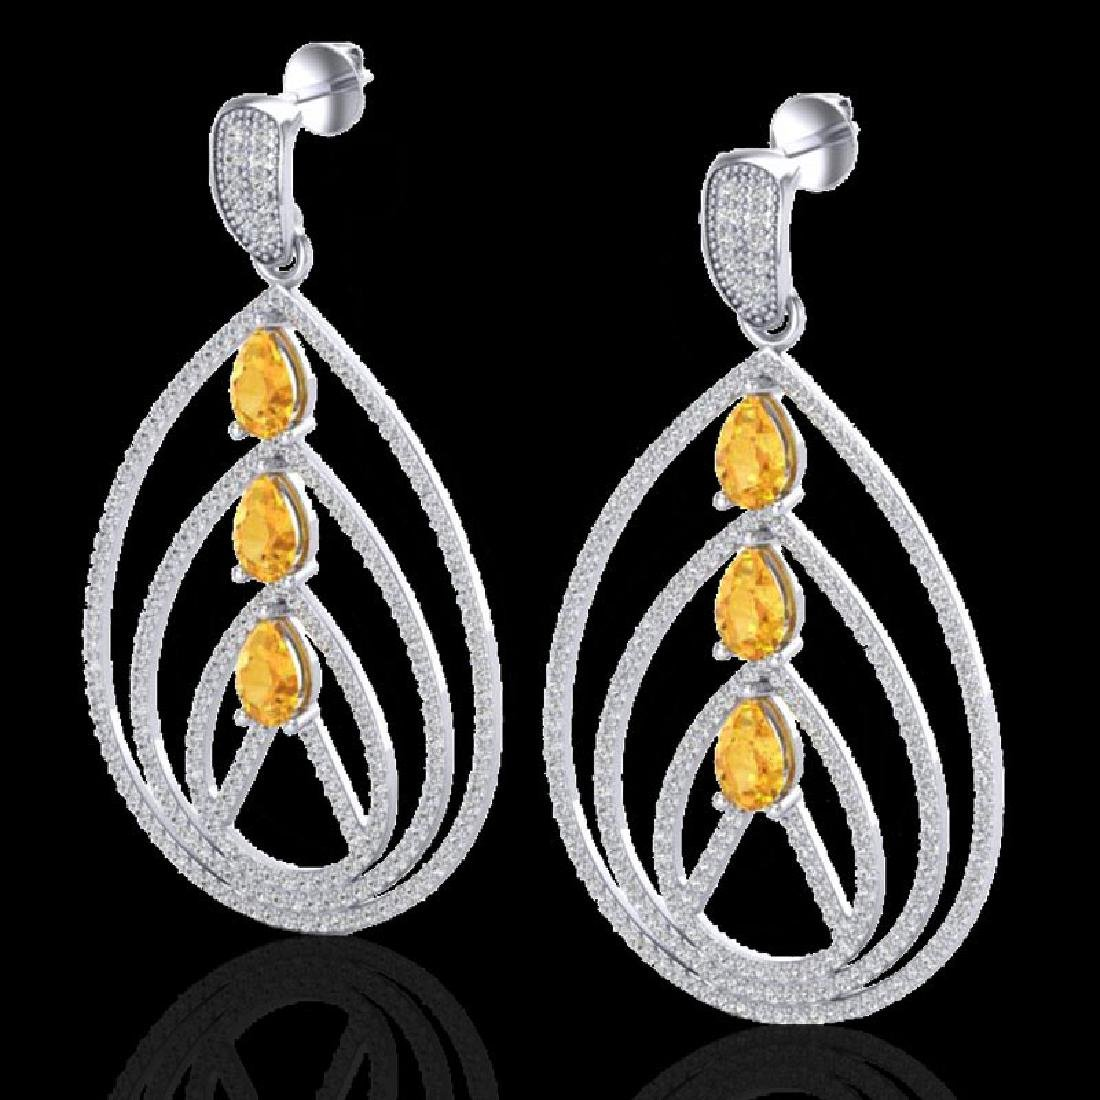 4 CTW Citrine & Micro Pave VS/SI Diamond Earrings 18K